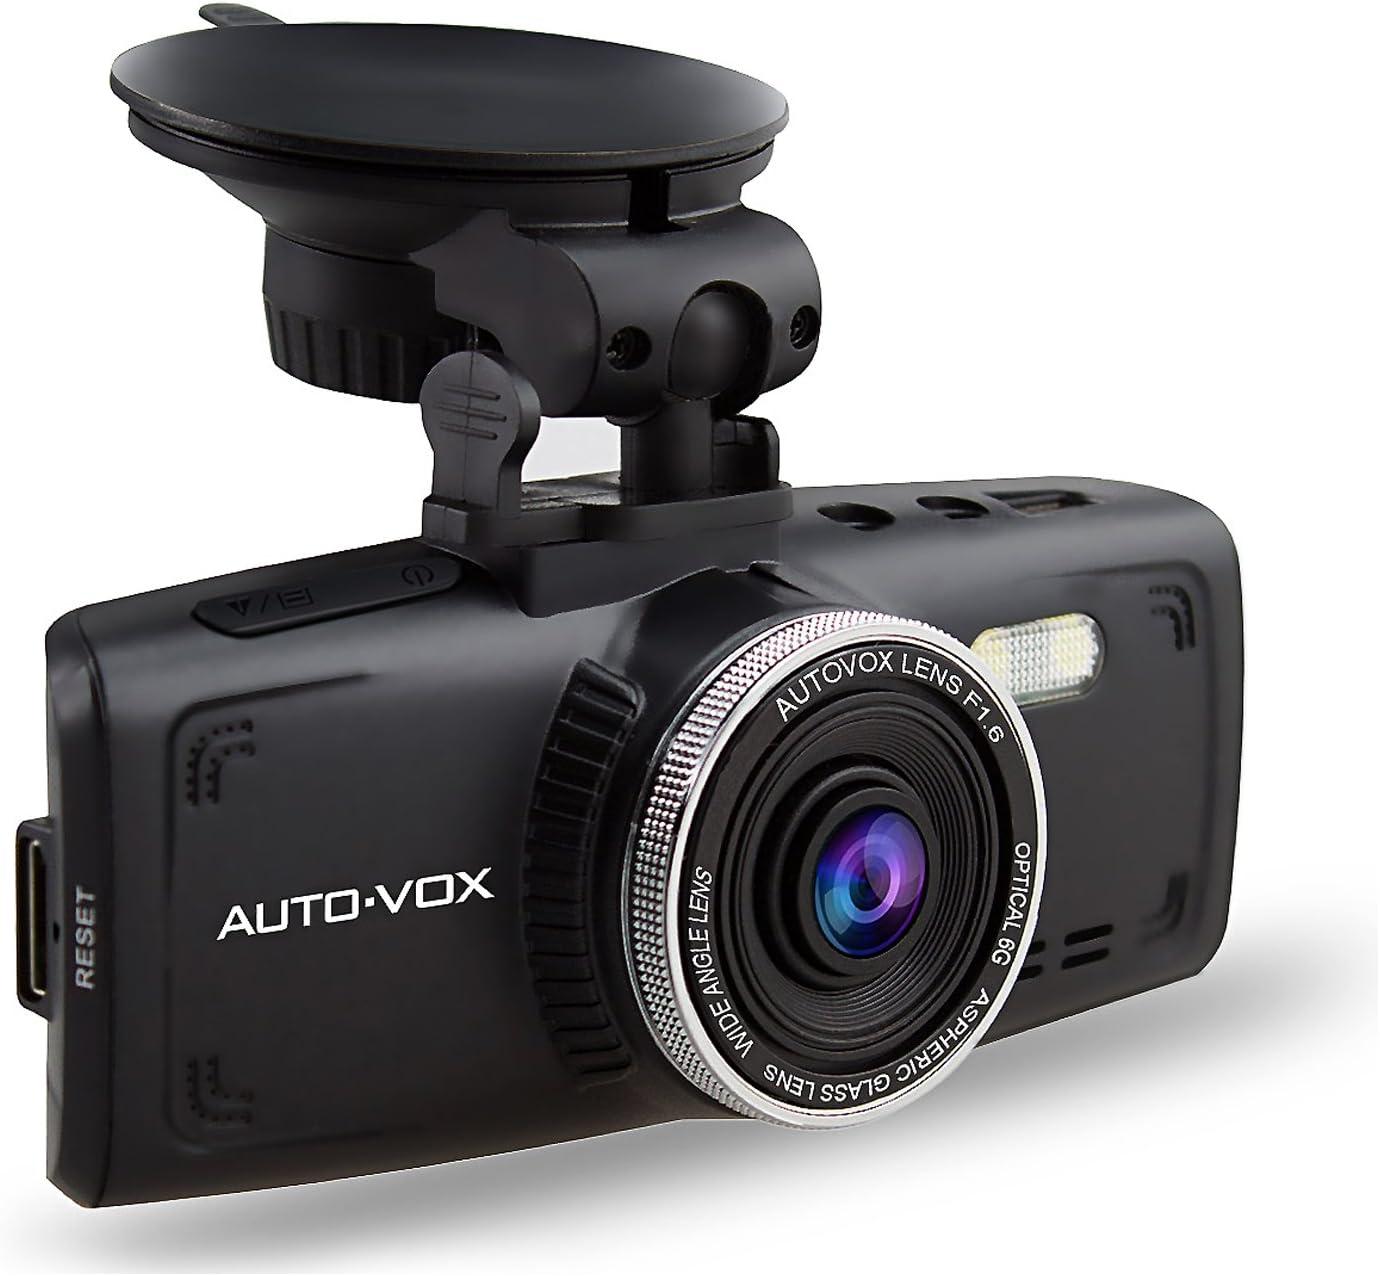 QEBIDUL Mini Car Dvr Dash Camera 1080P Full Hd 170 Degree Wide View Angle Vehicle Automobile Dash Cam Recorder Registrator Night Vision in Car Video Camera